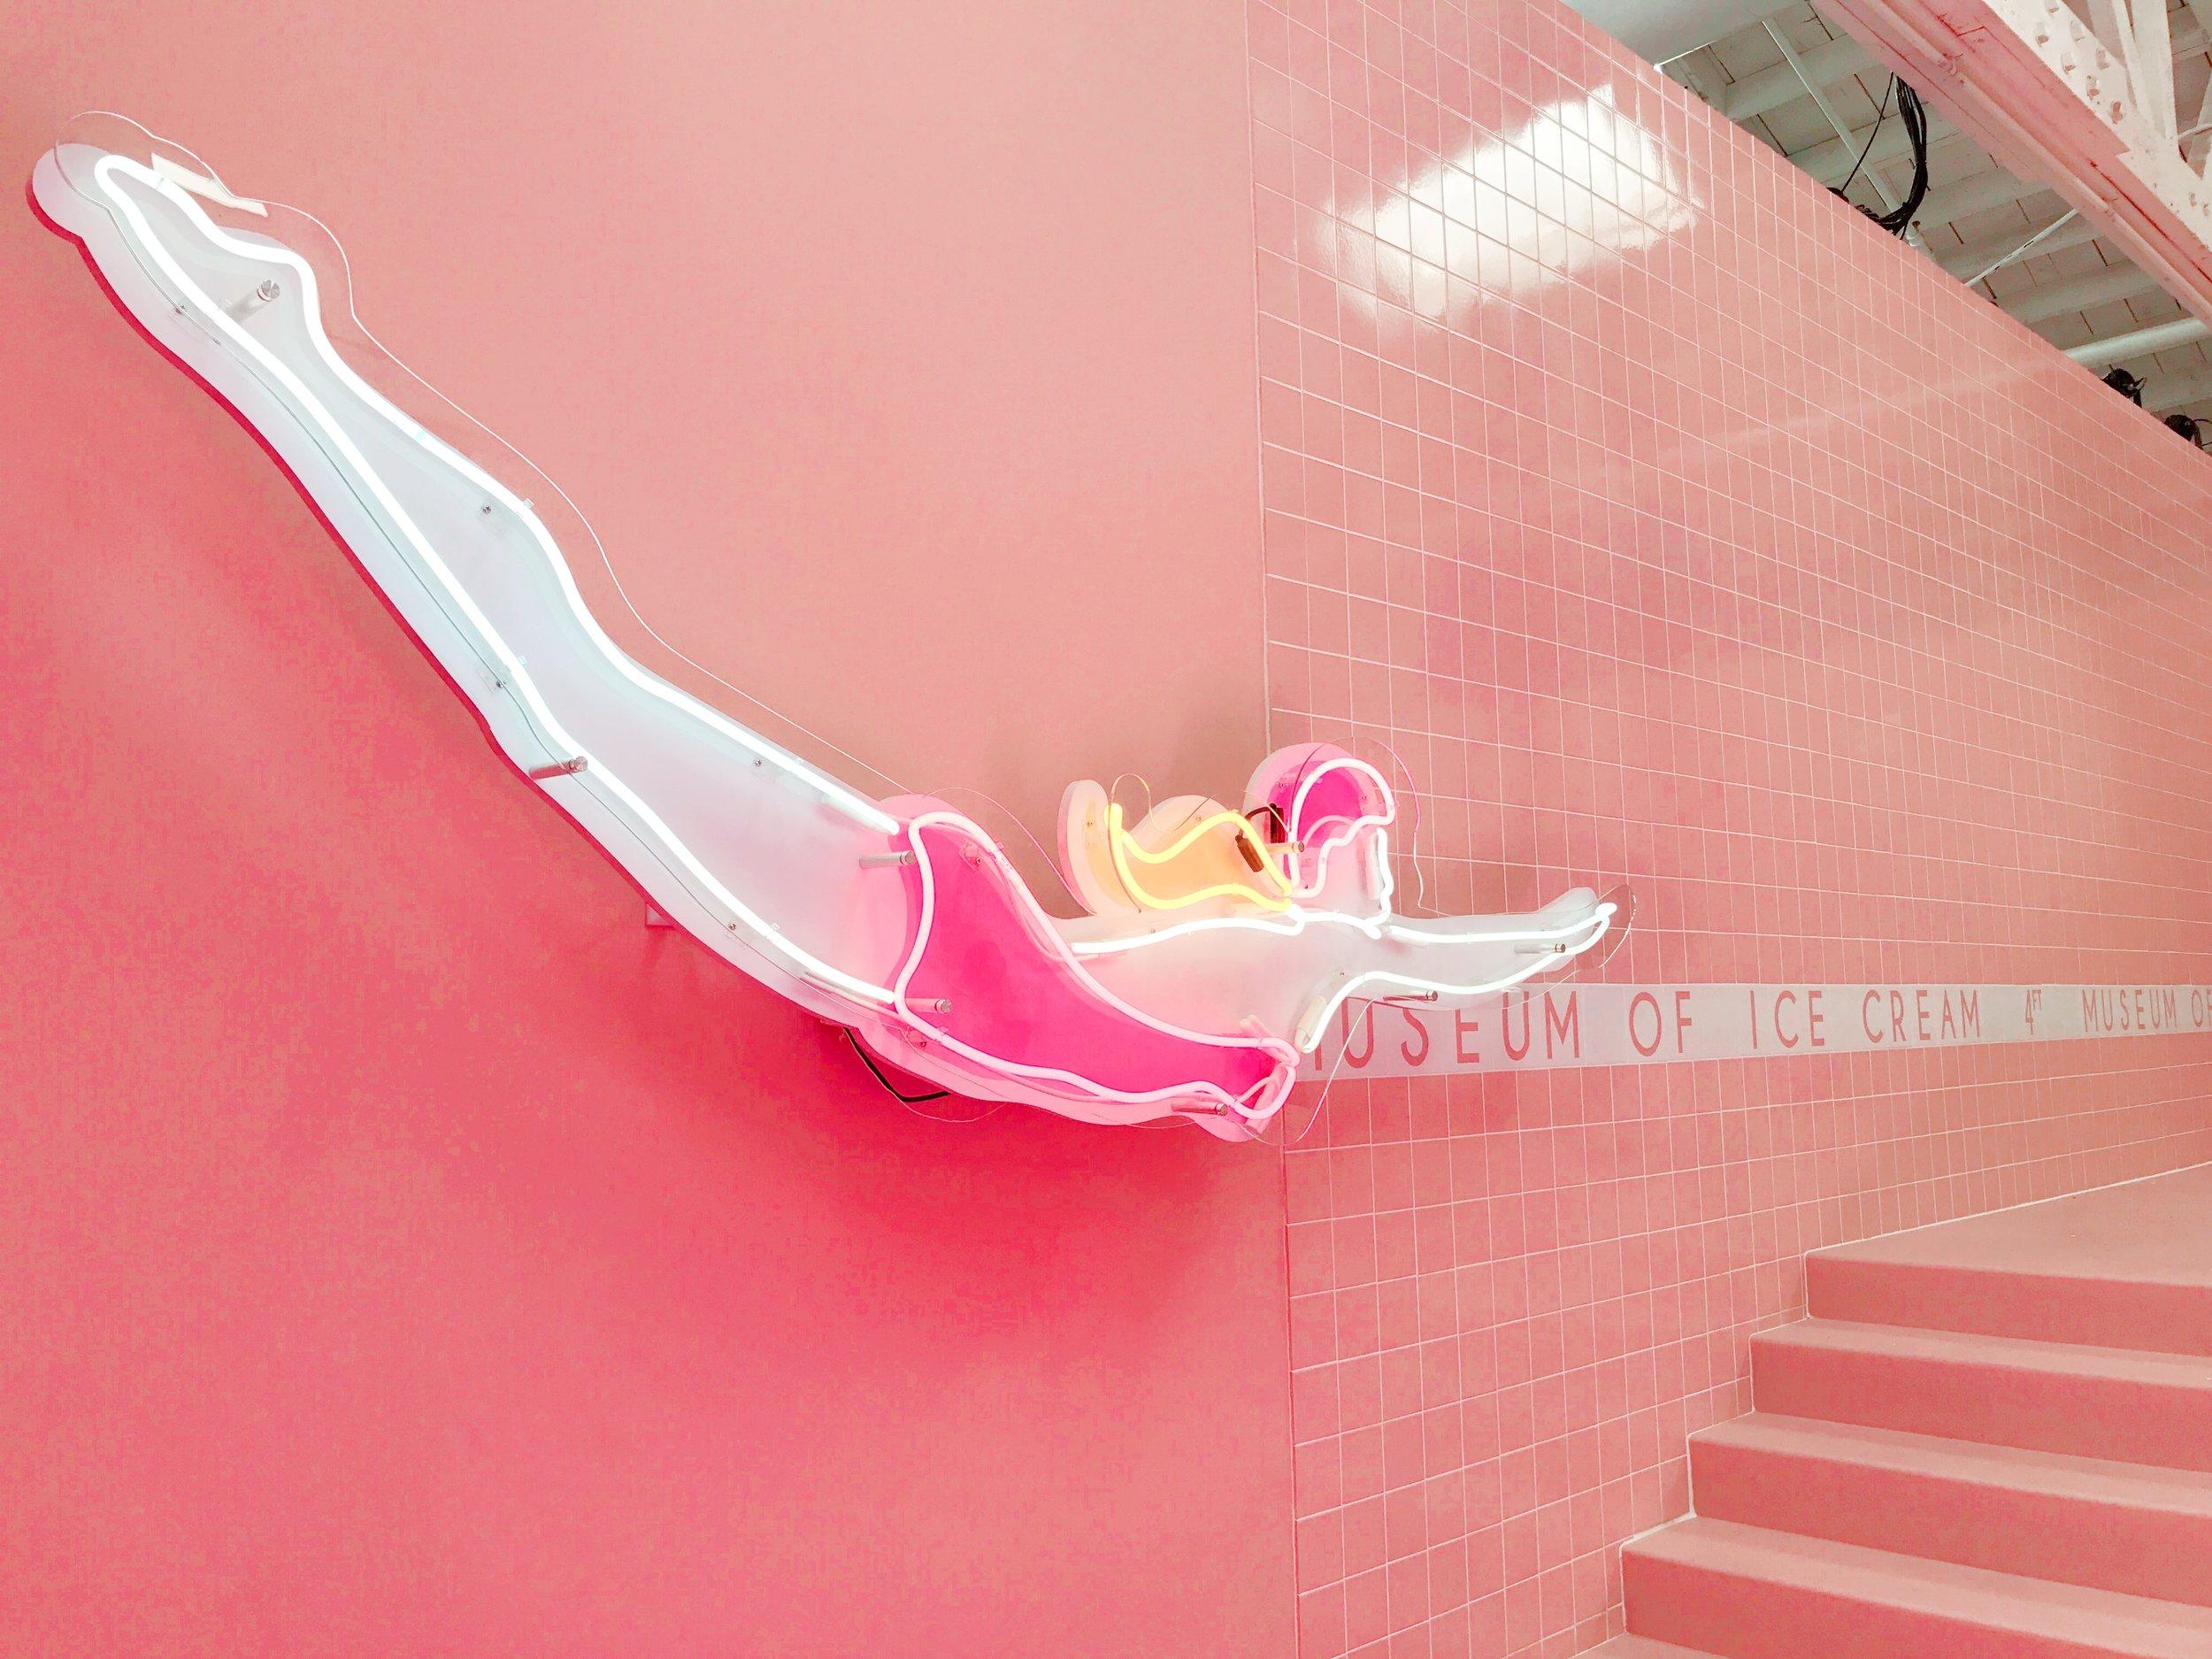 Ice Cream Museum Los Angeles Sprinkle Pool Neon Dive Sign